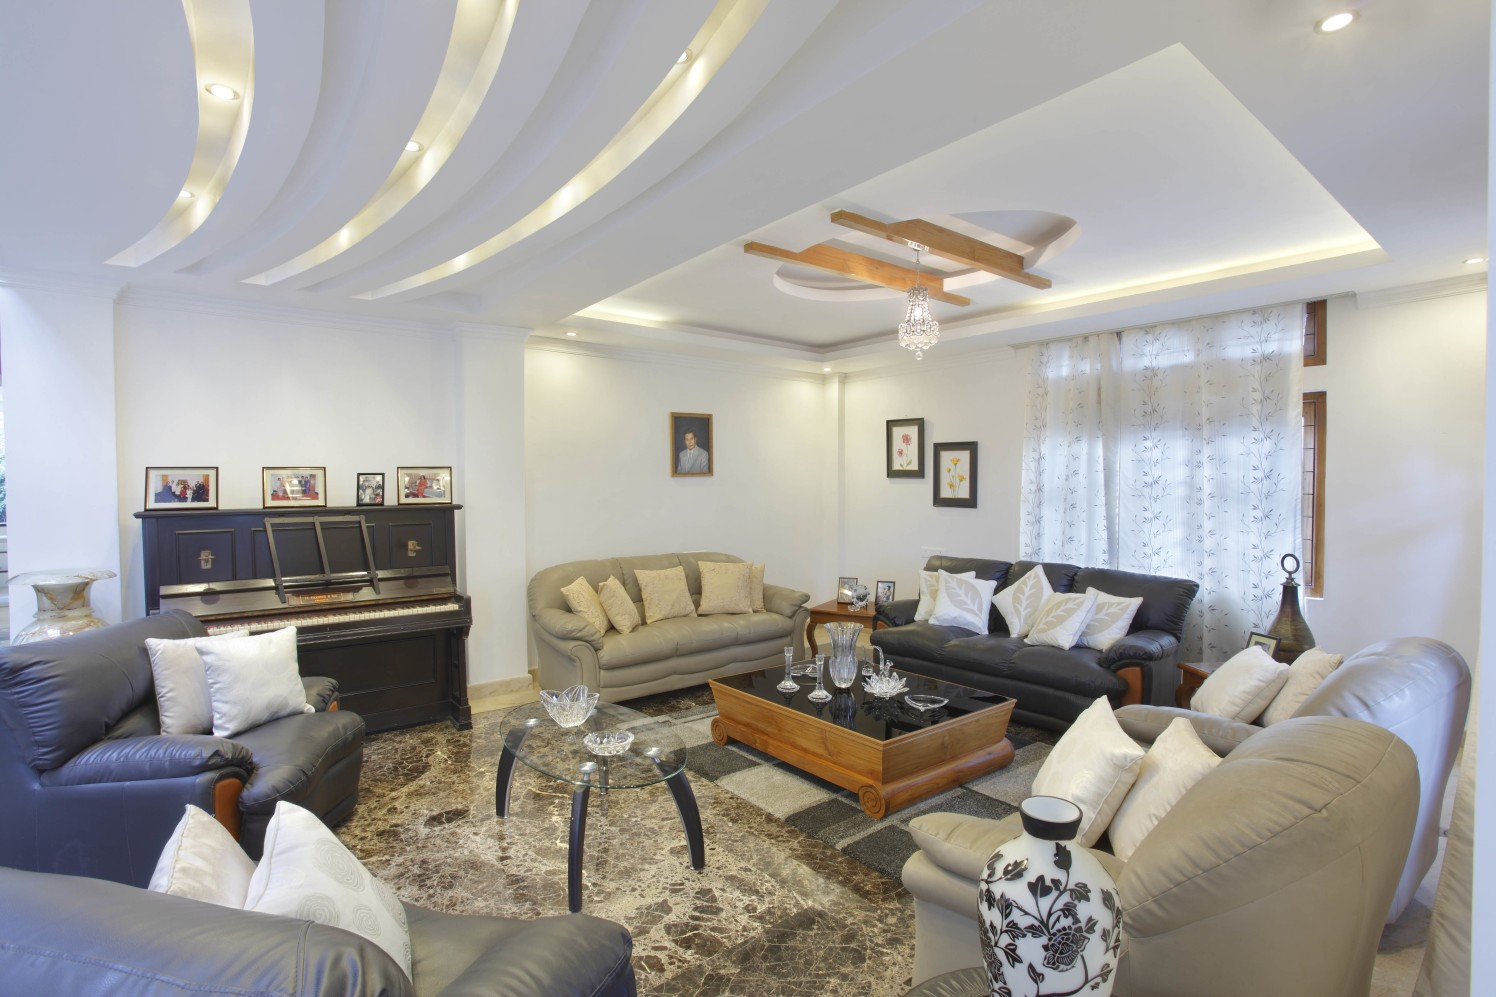 Living Room With Bulky Furniture by Prashant Ghosh Living-room Contemporary | Interior Design Photos & Ideas